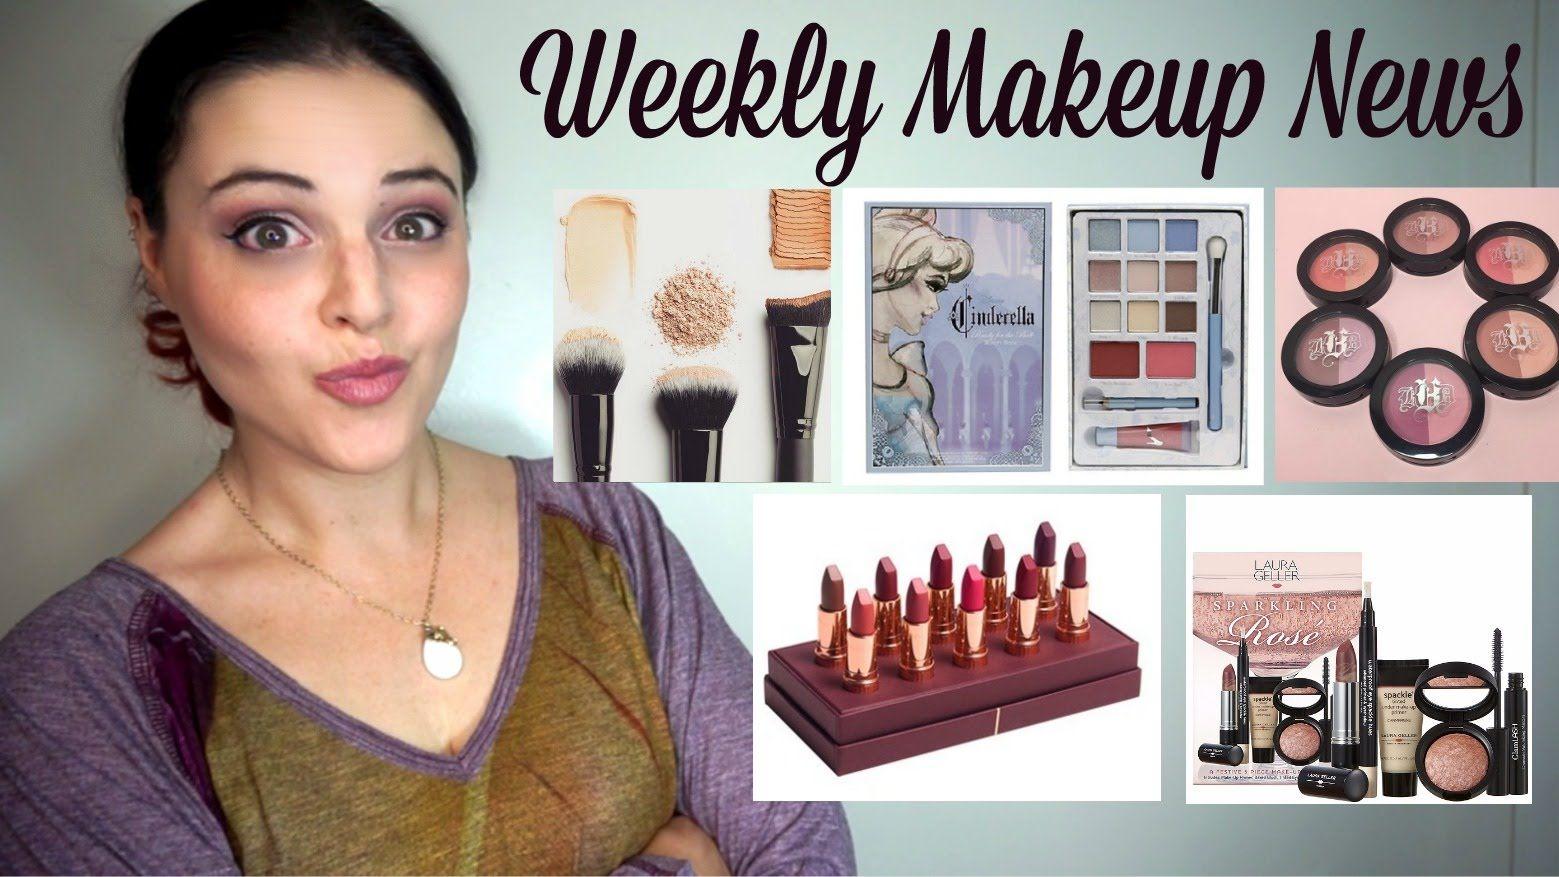 What's Up In Makeup - Makeup NEWS - Week of November 8, 2015 * Jen Luv's...